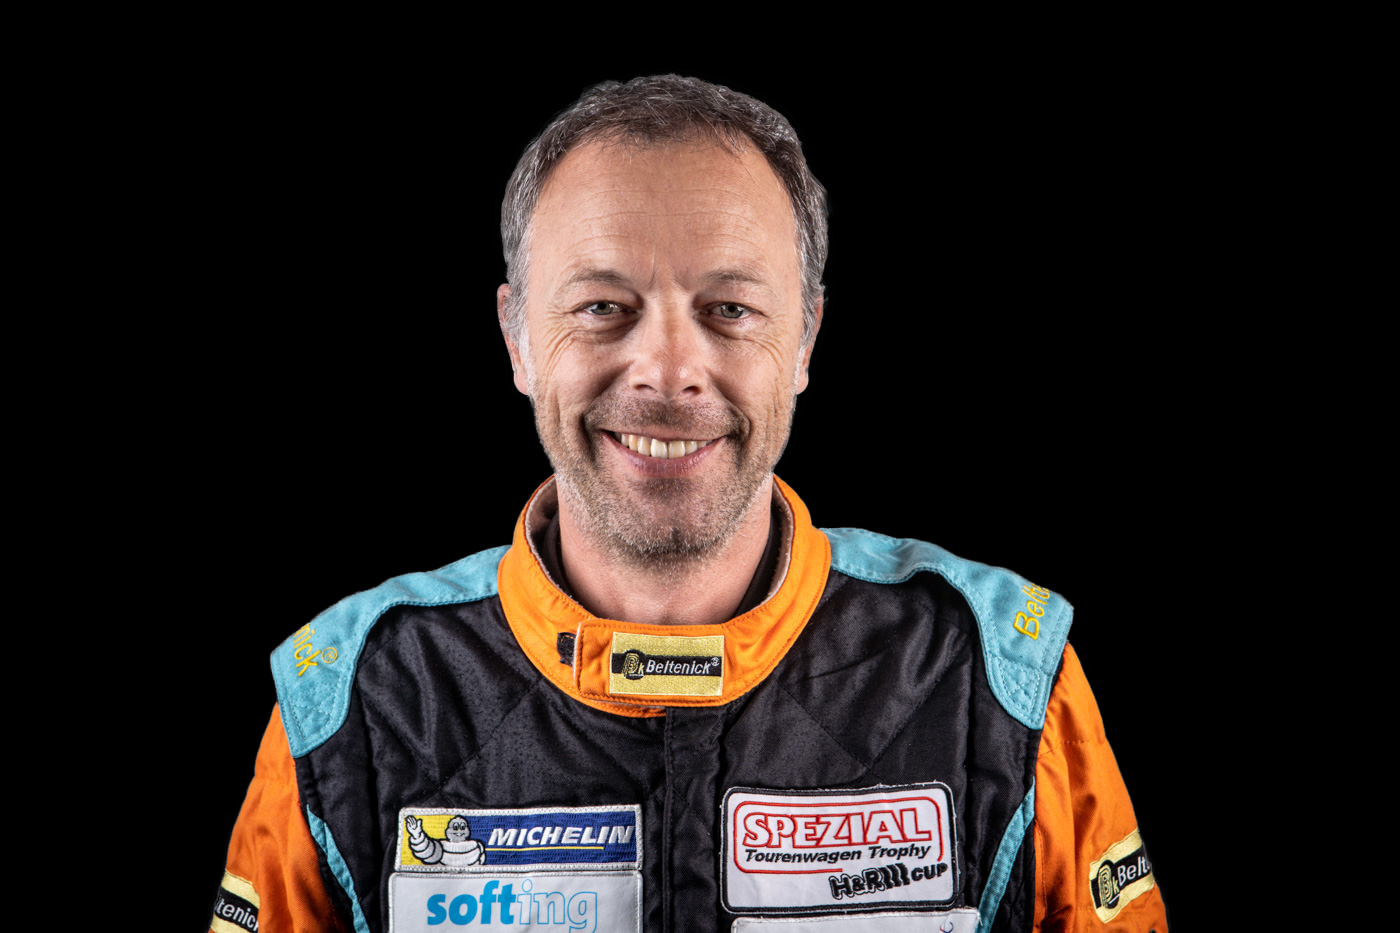 Ulf Ehninger Portrait